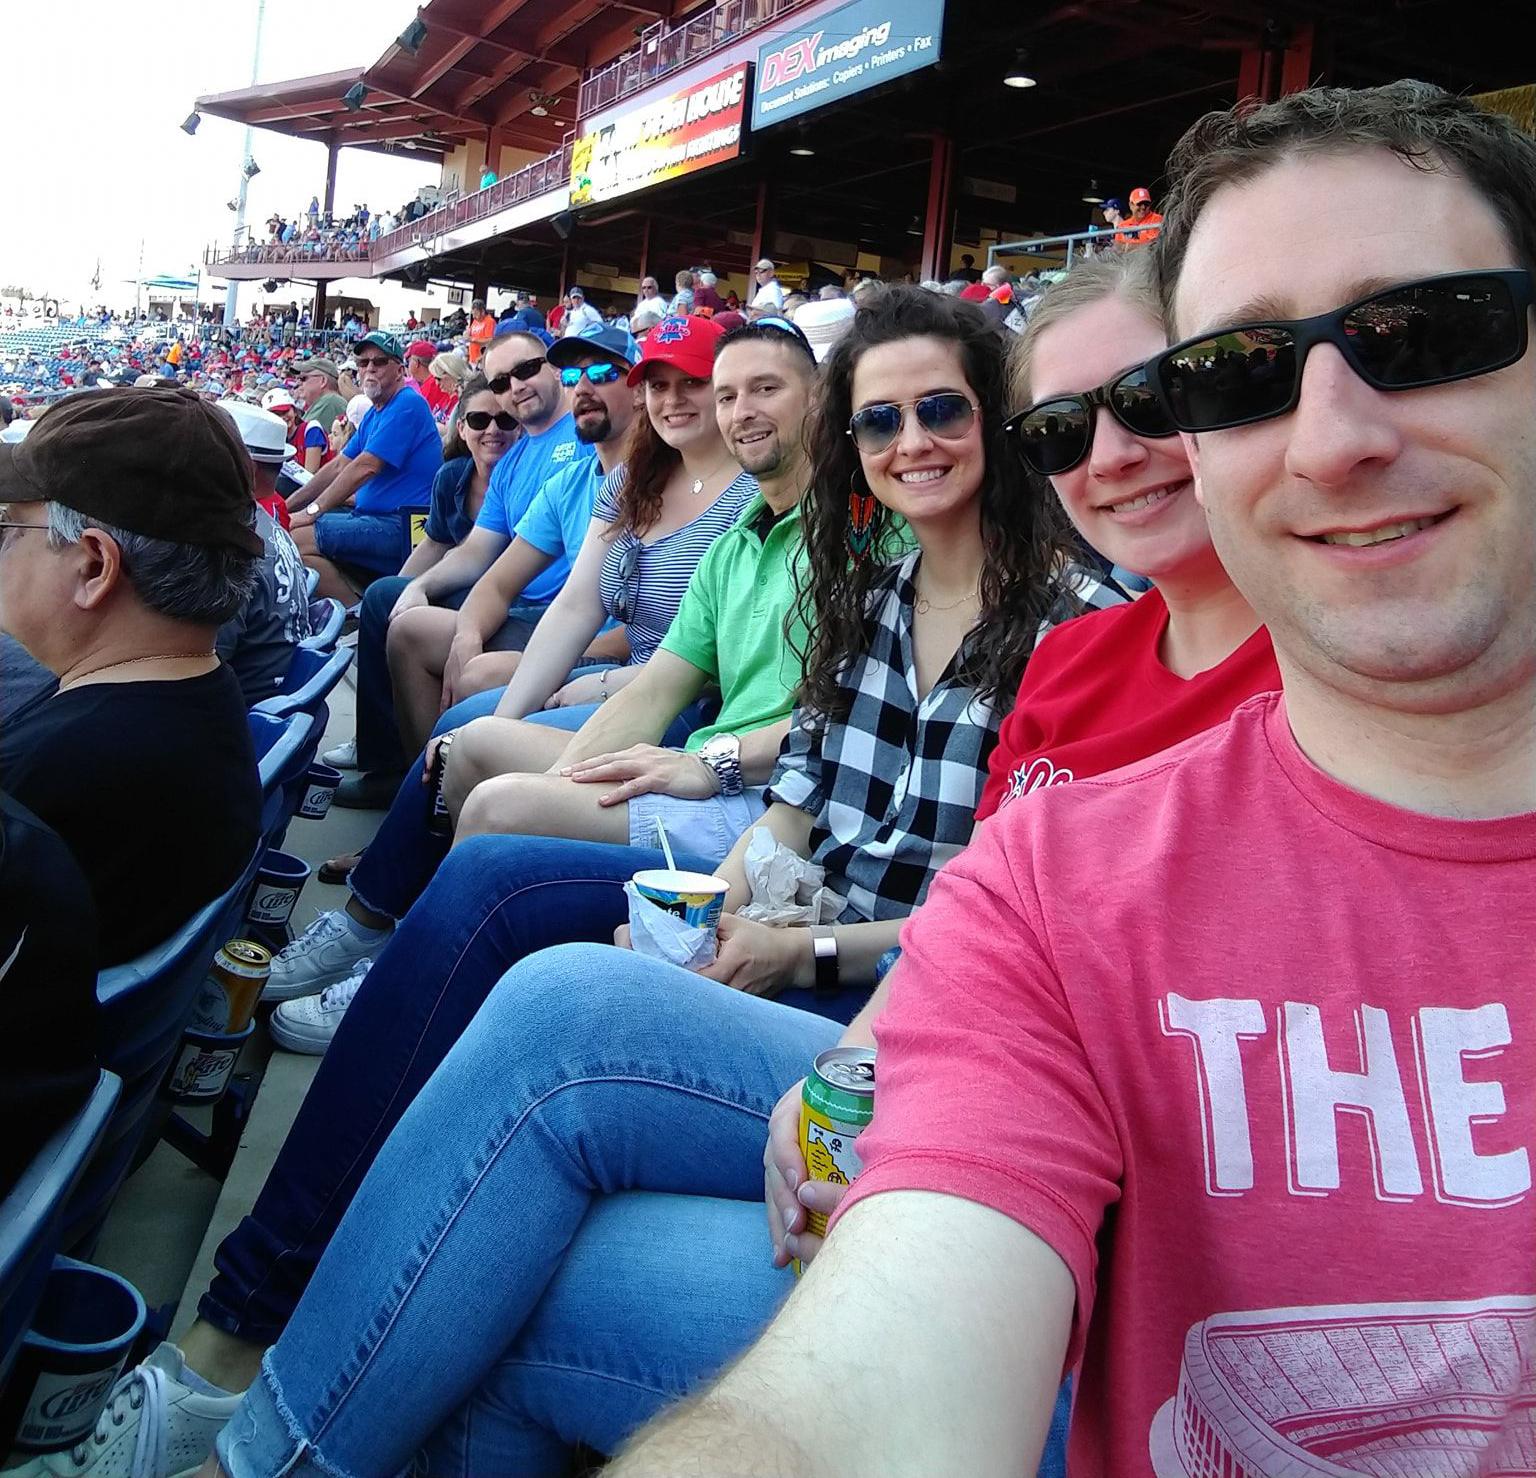 YPs at February 2020 baseball game